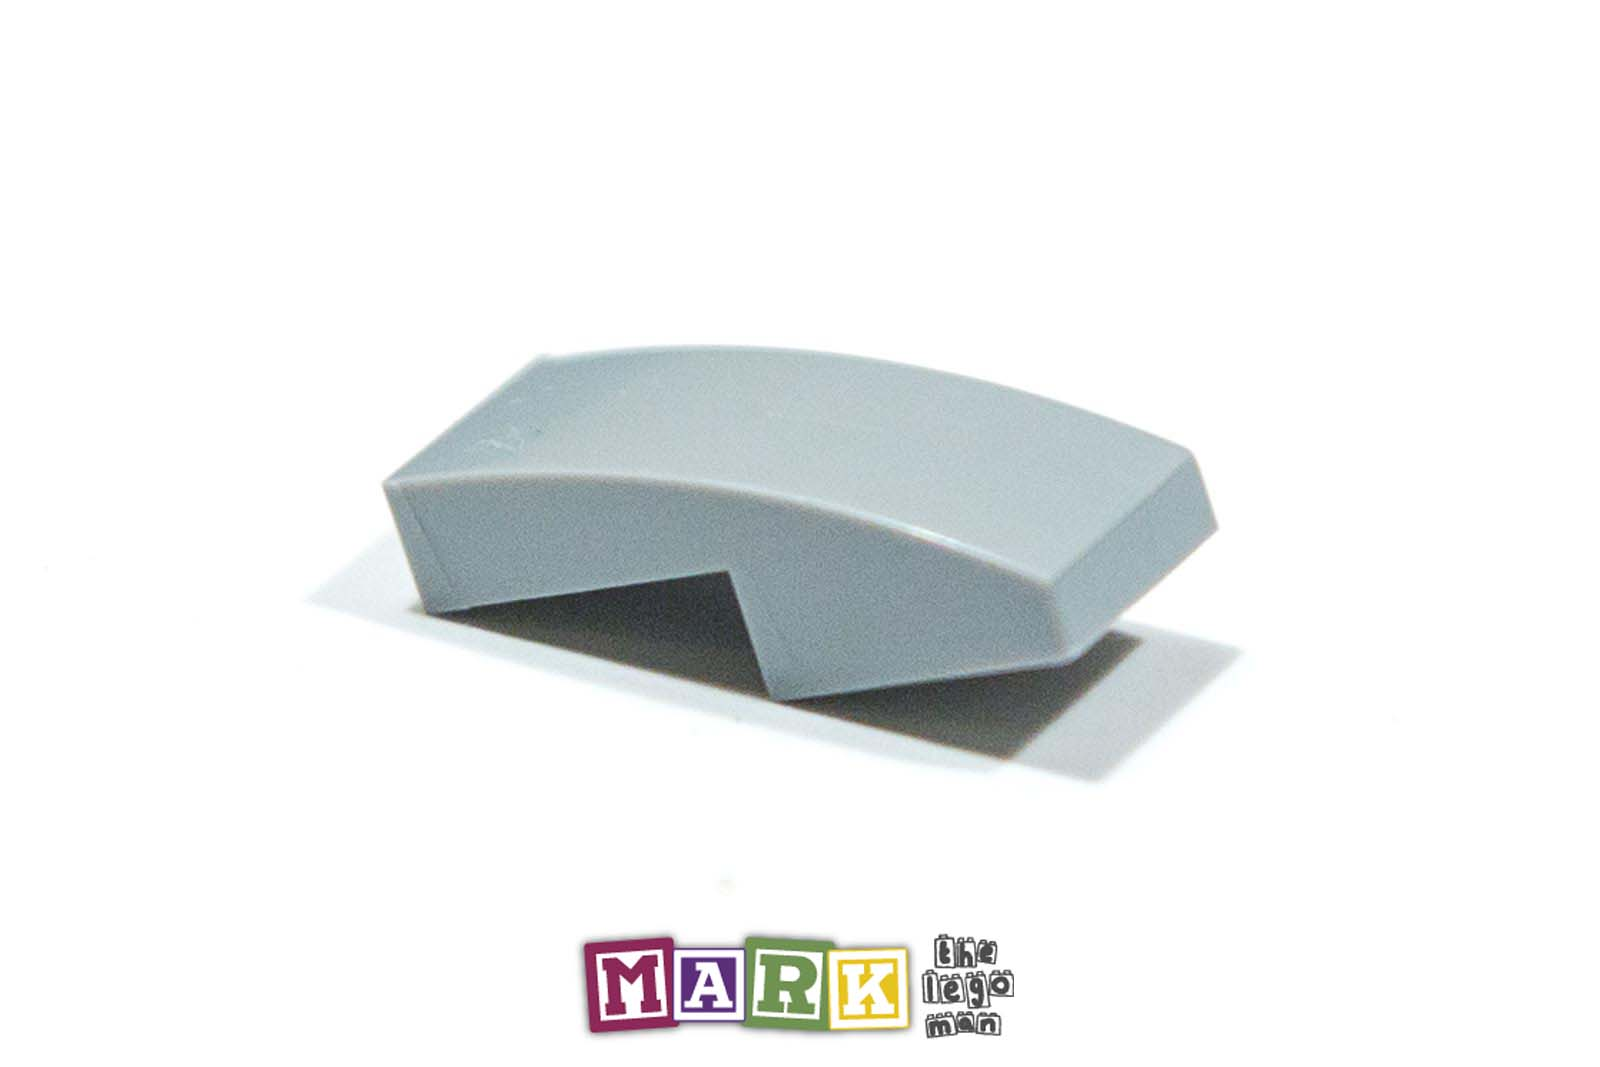 Lego 6028813 11477 1x Light Blueish Grey Md Stone Medium Standard Grey 1x2x2 3 Sloped Plate With Bow